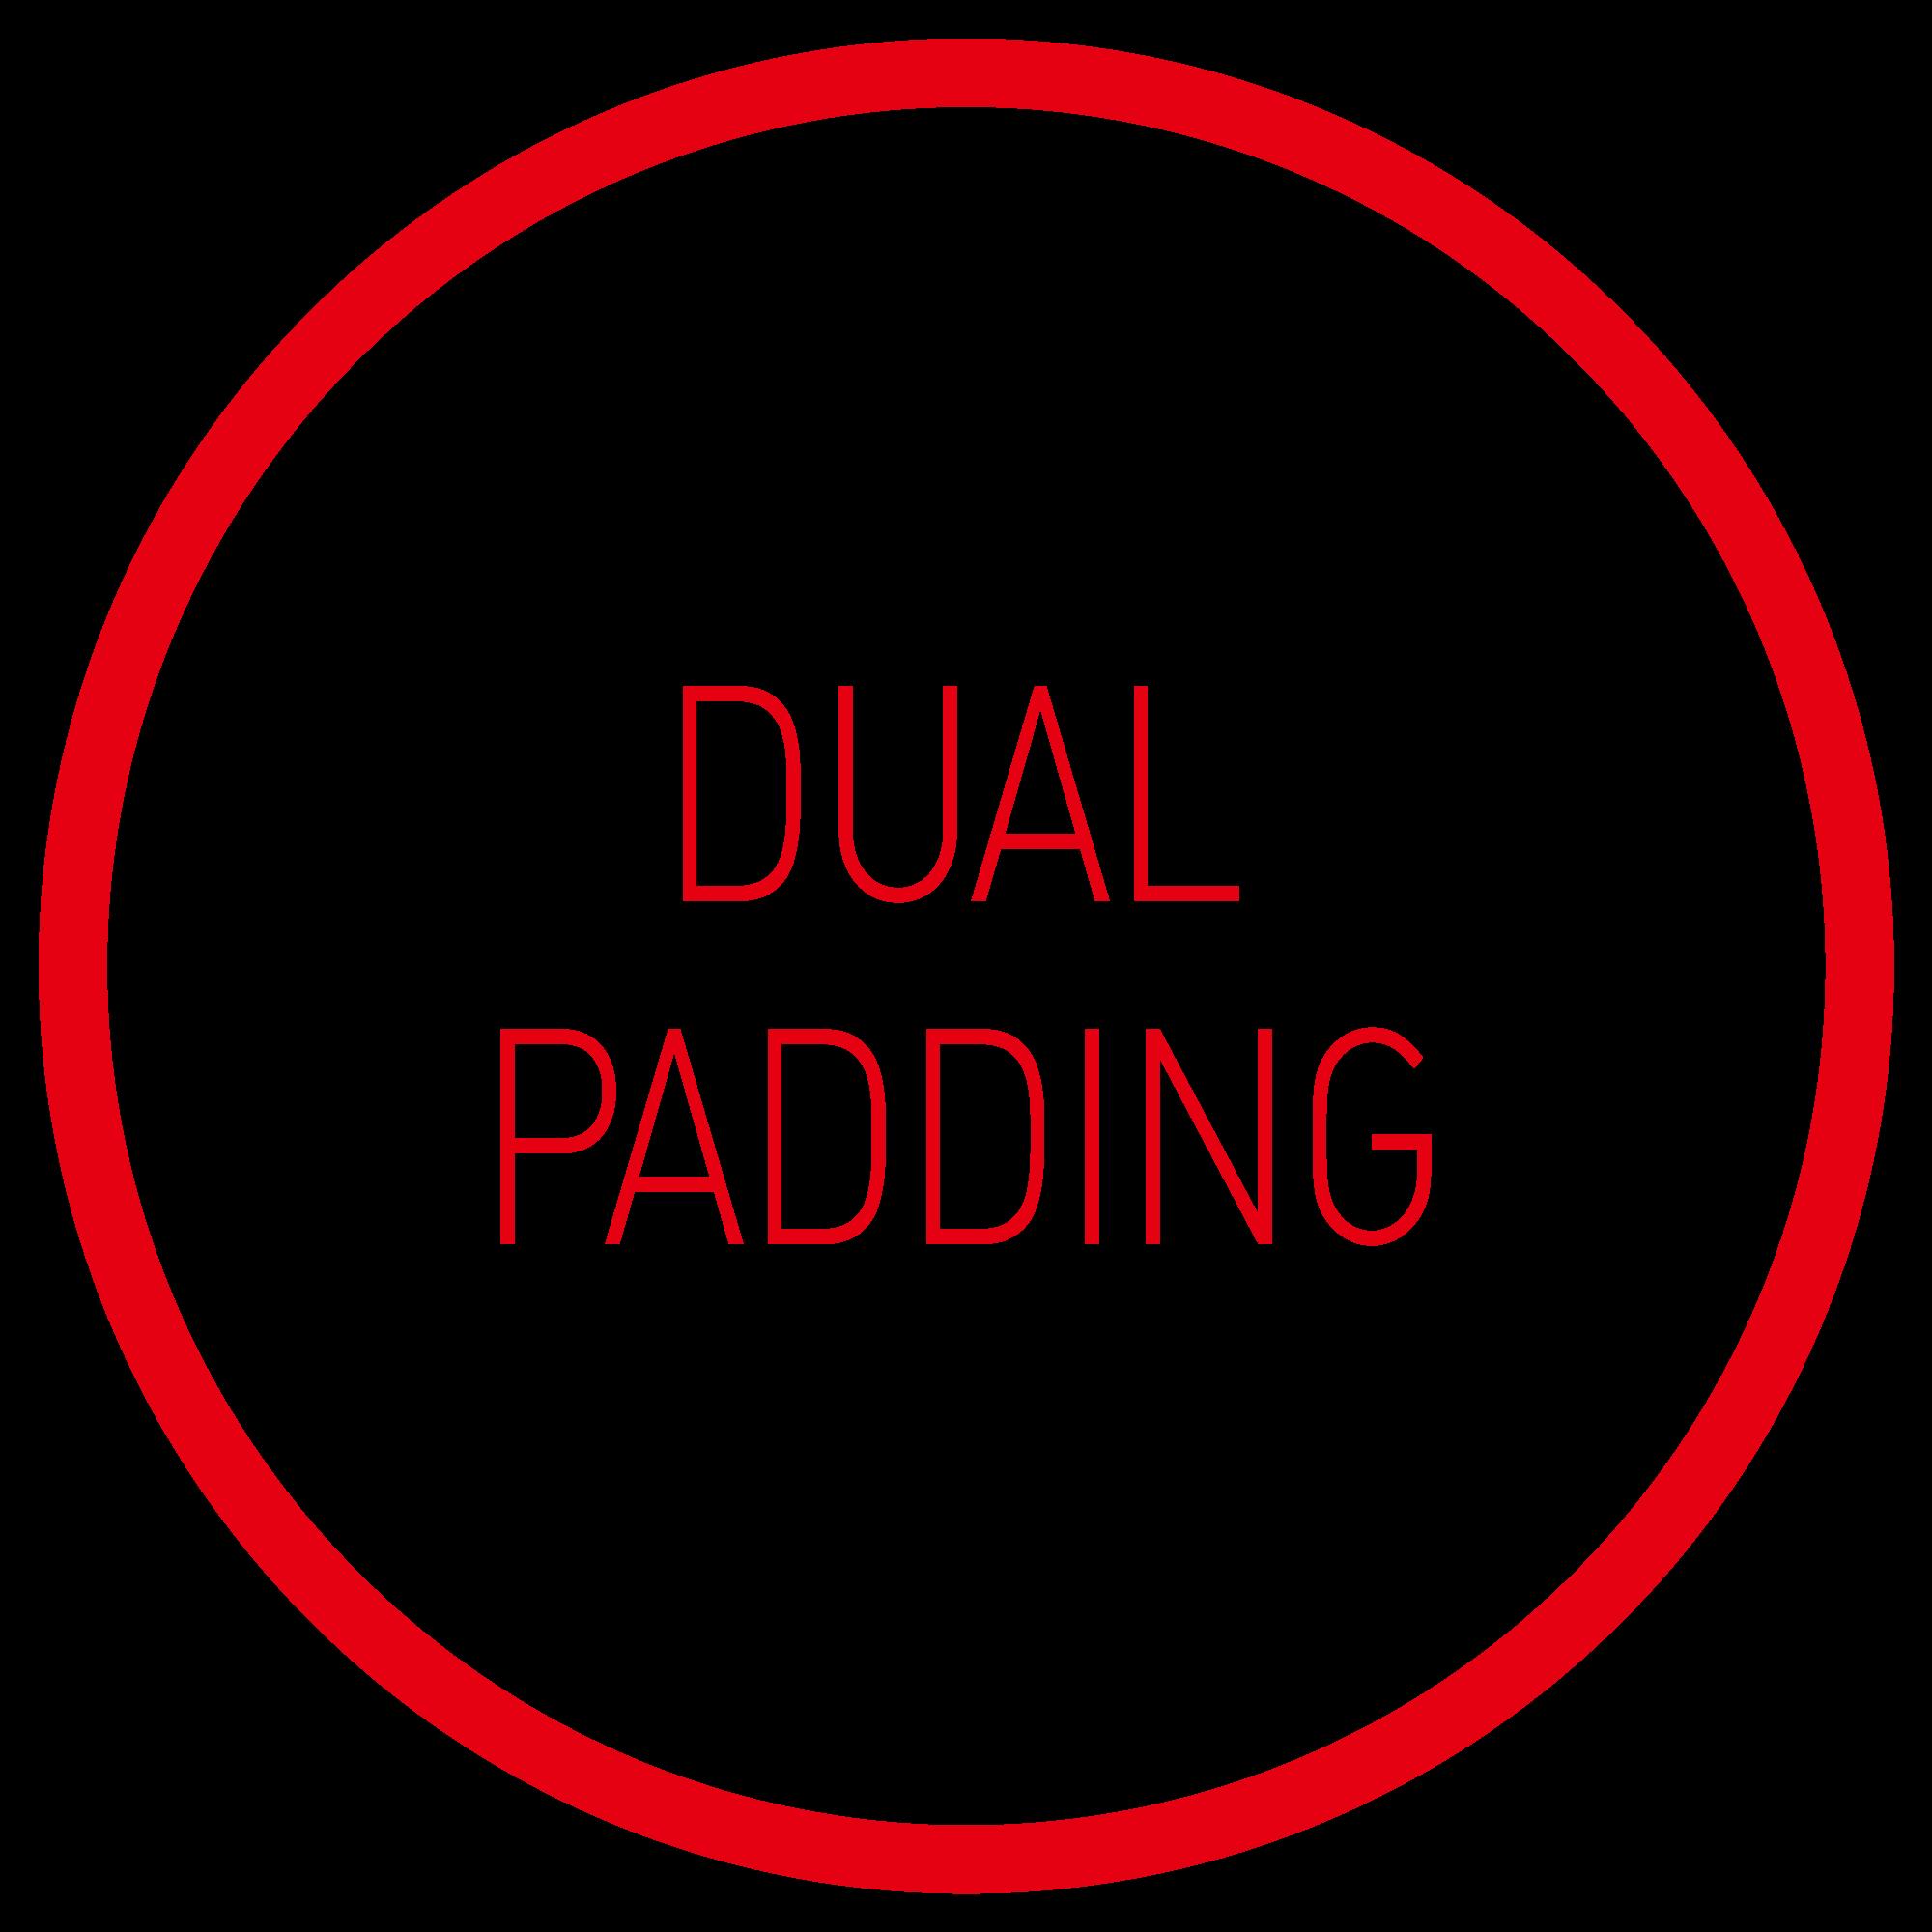 Selle-Italia-icon-04-dual-padding